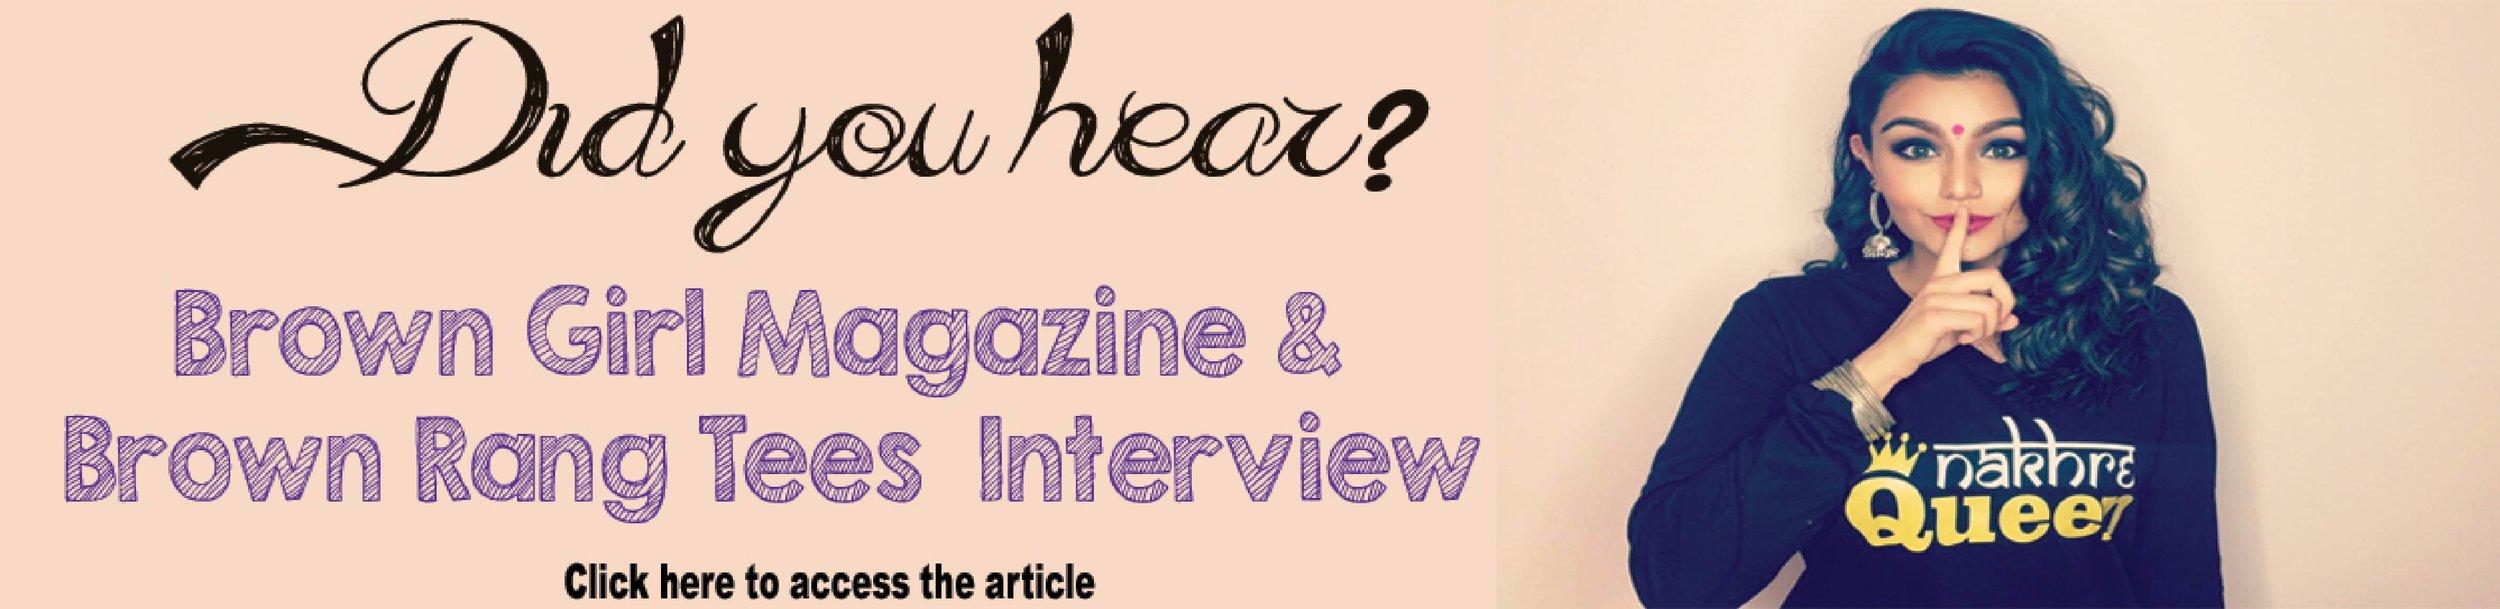 Brown-girl-magazine-brown-rang-tees-interview-desi